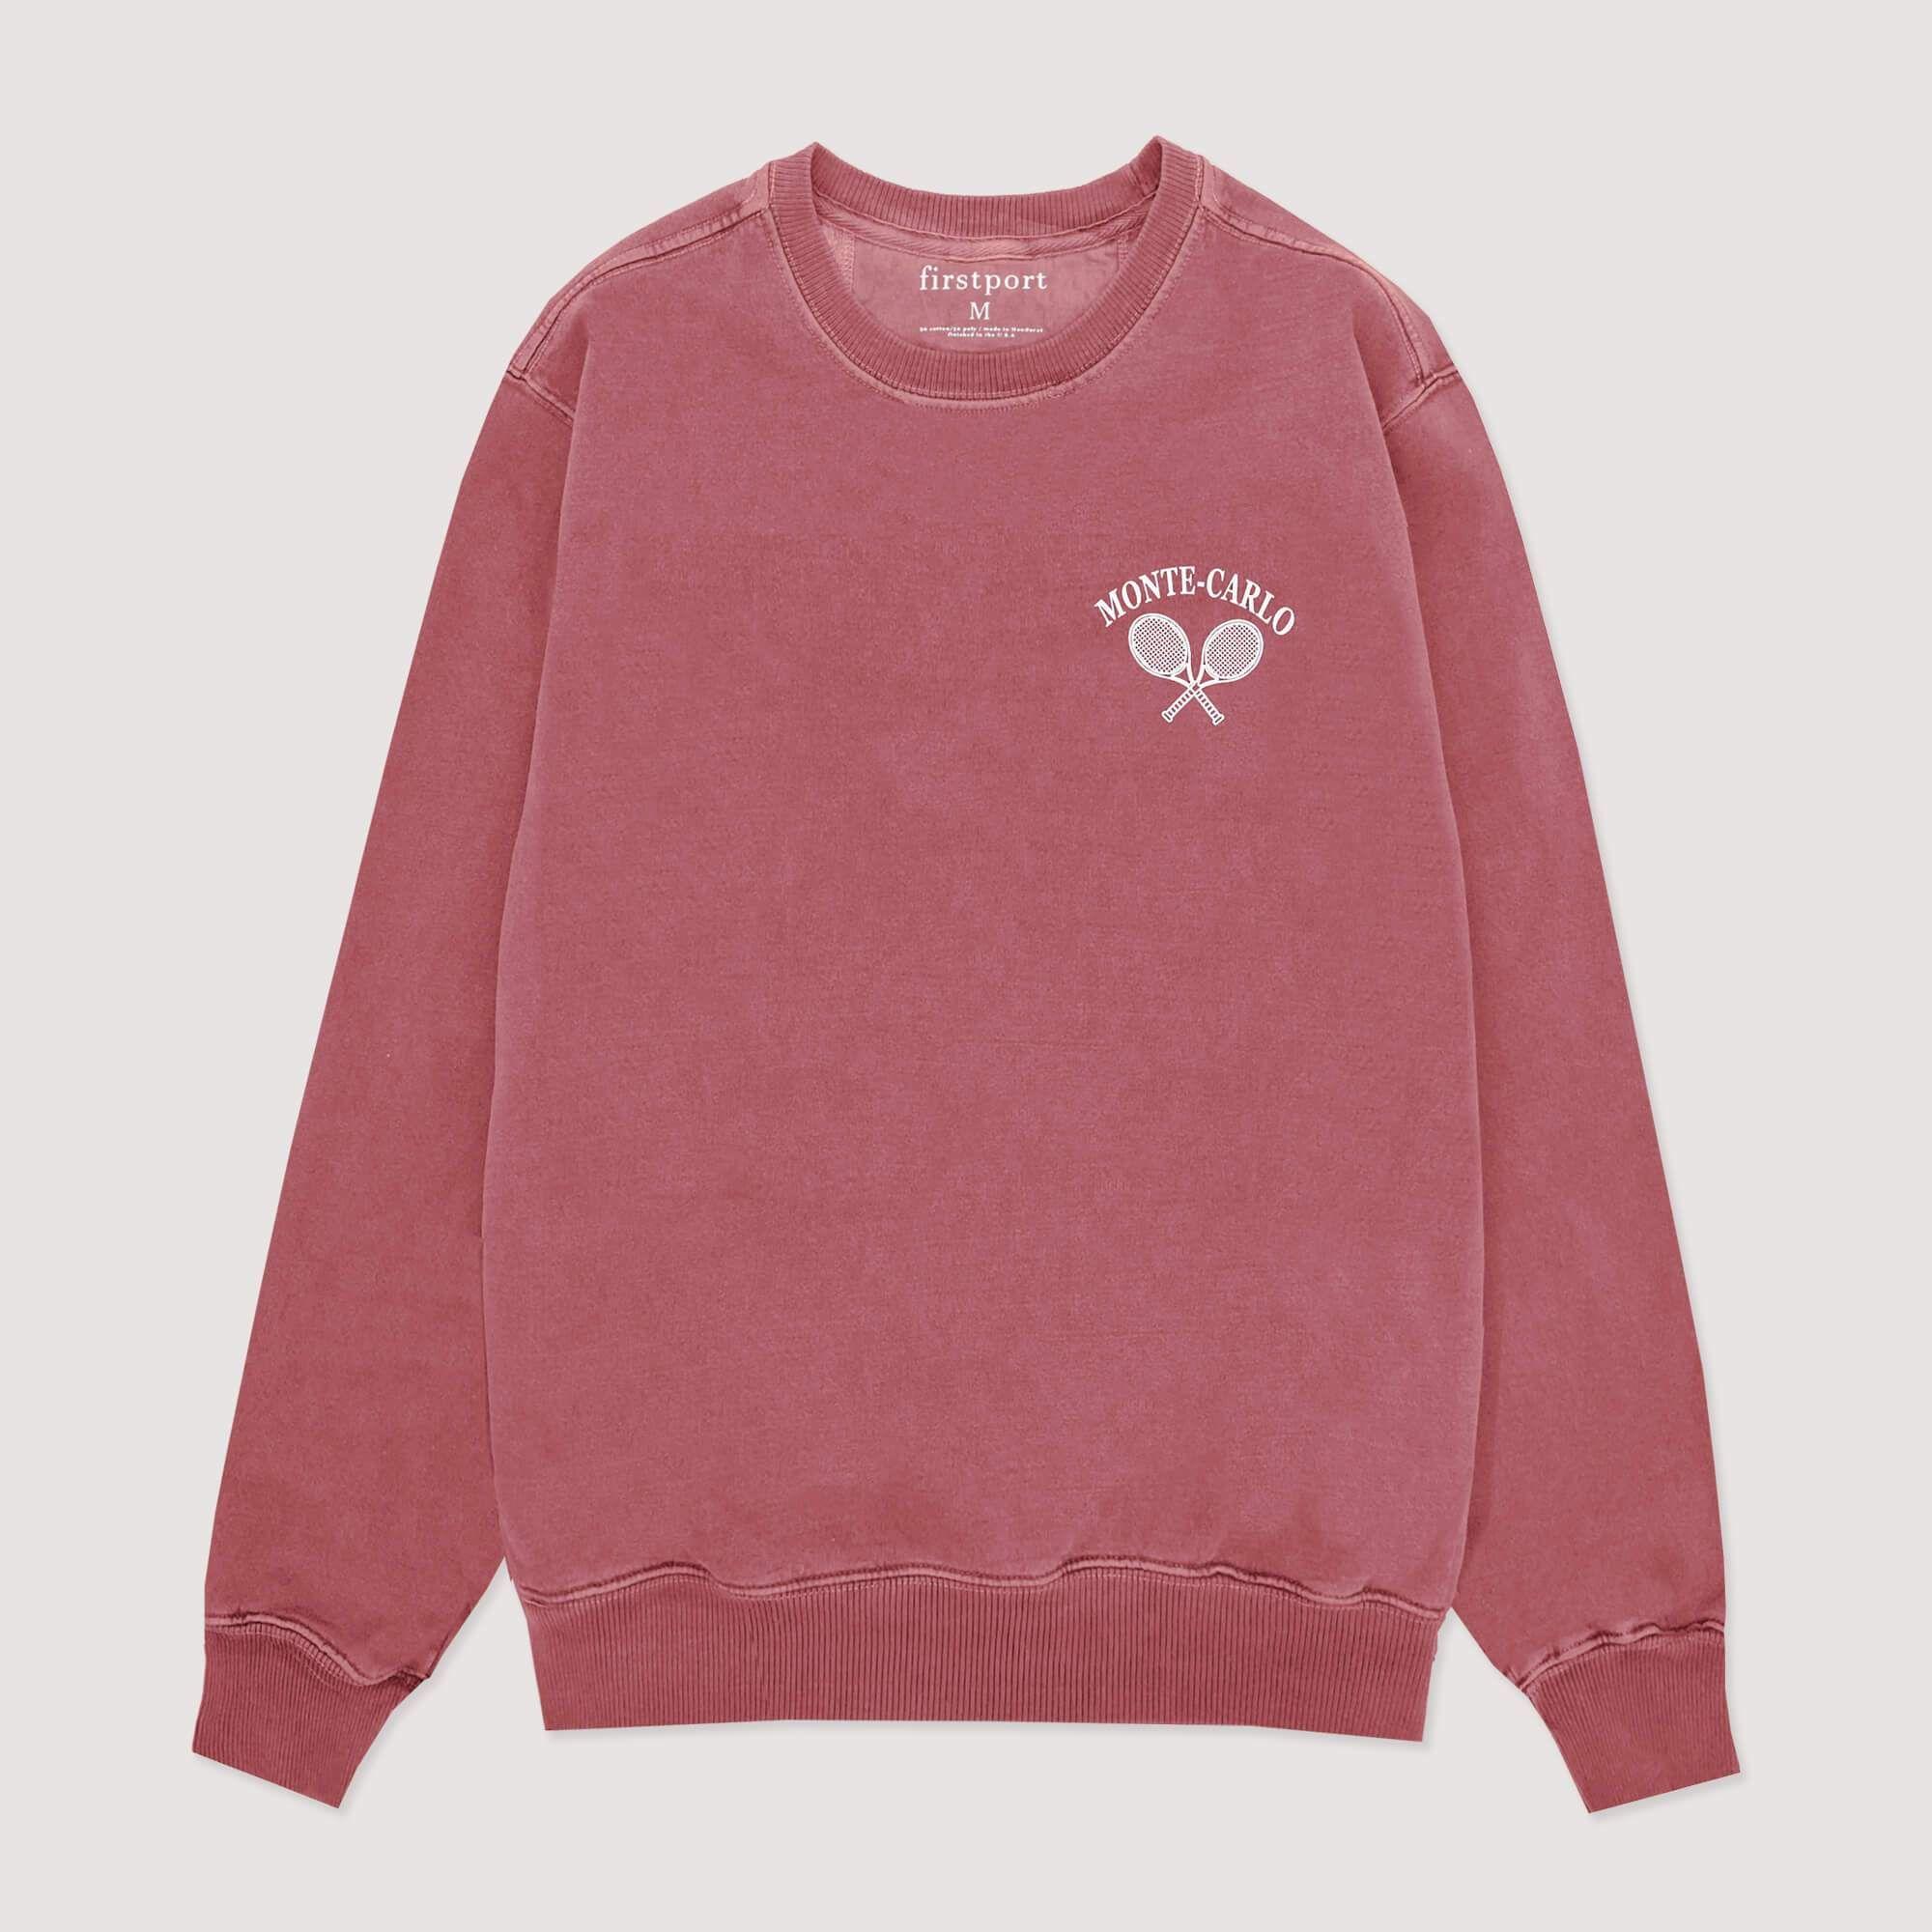 Notesdurable Firstport Crewneck Sweatshirt Details80 20 Garment Dyed Fleece Crewneck Ribbed Trim At Cuff And C Crew Neck Sweatshirt Sweatshirts Rowing Blazers [ 2000 x 2000 Pixel ]